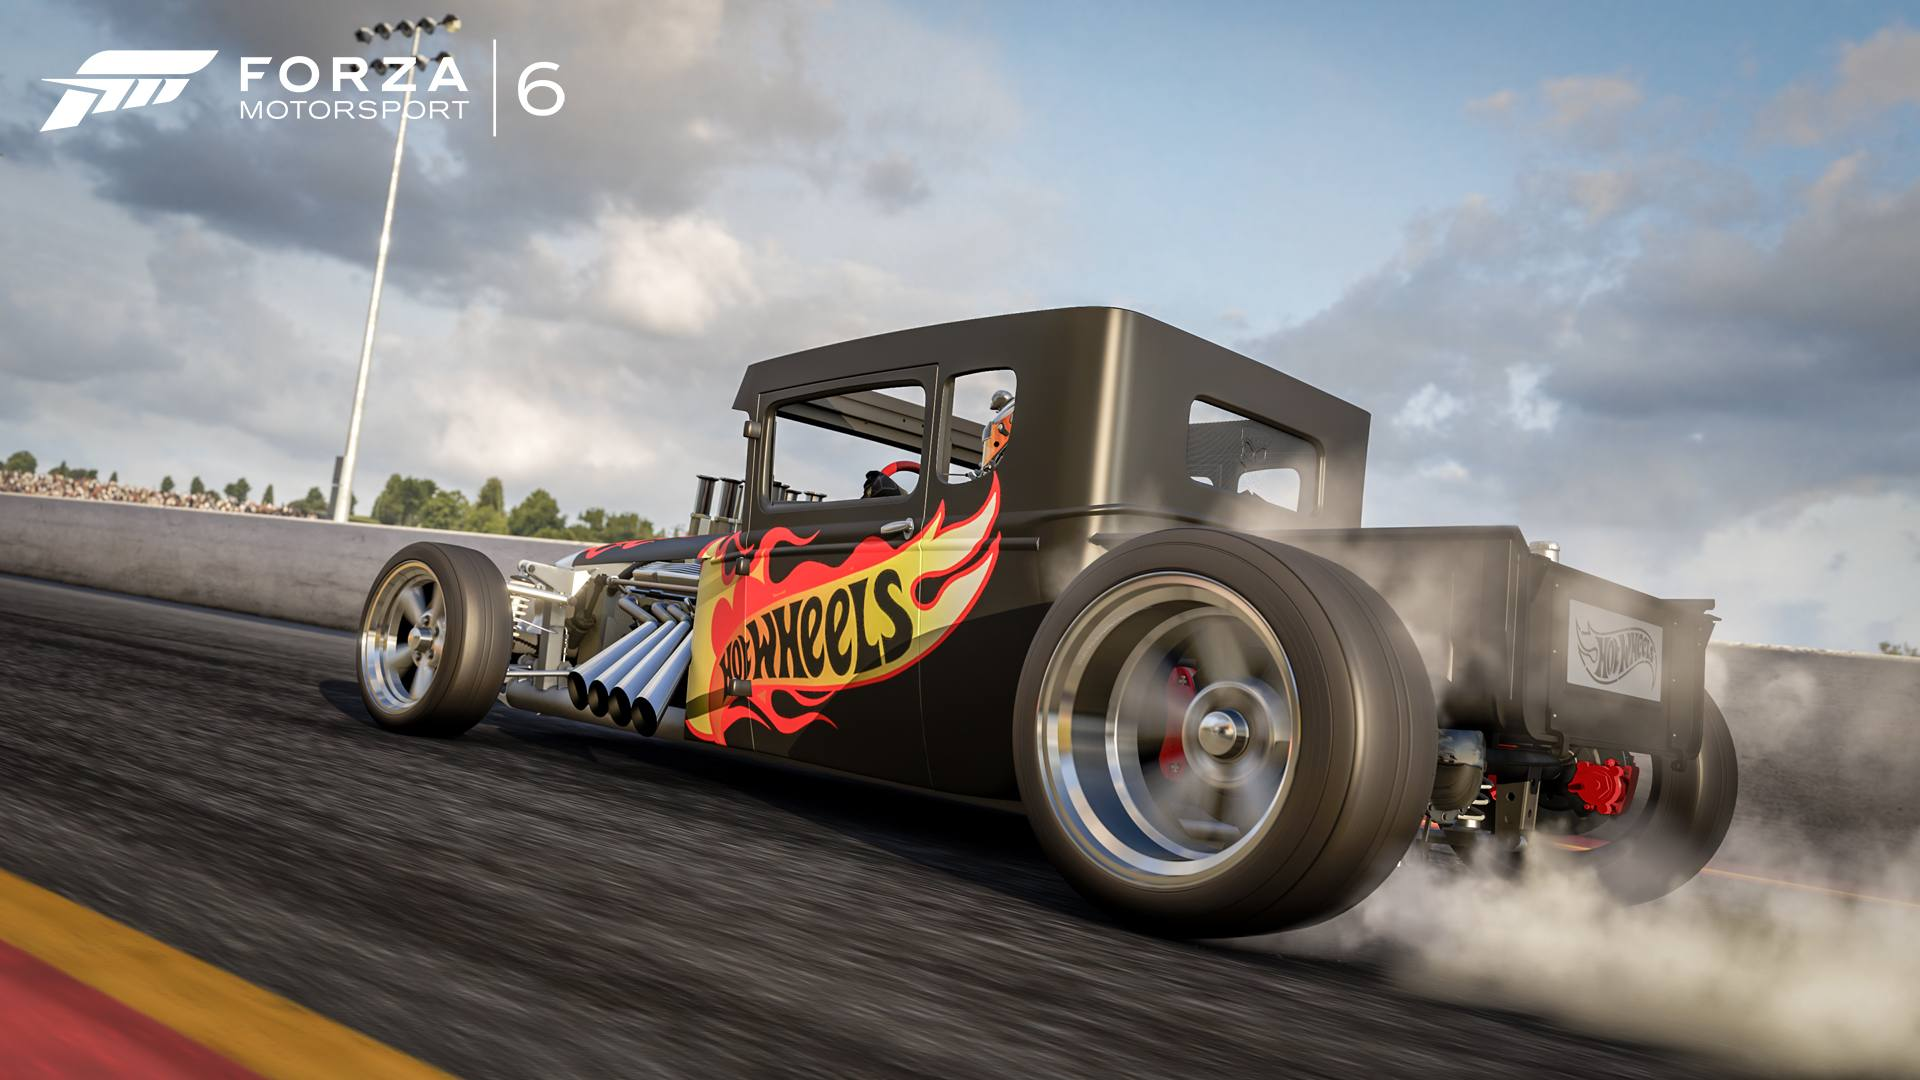 Forza Motorsport 6 DLC Hot Wheels 03-05-16 2011 Hot Wheels Bone Shaker